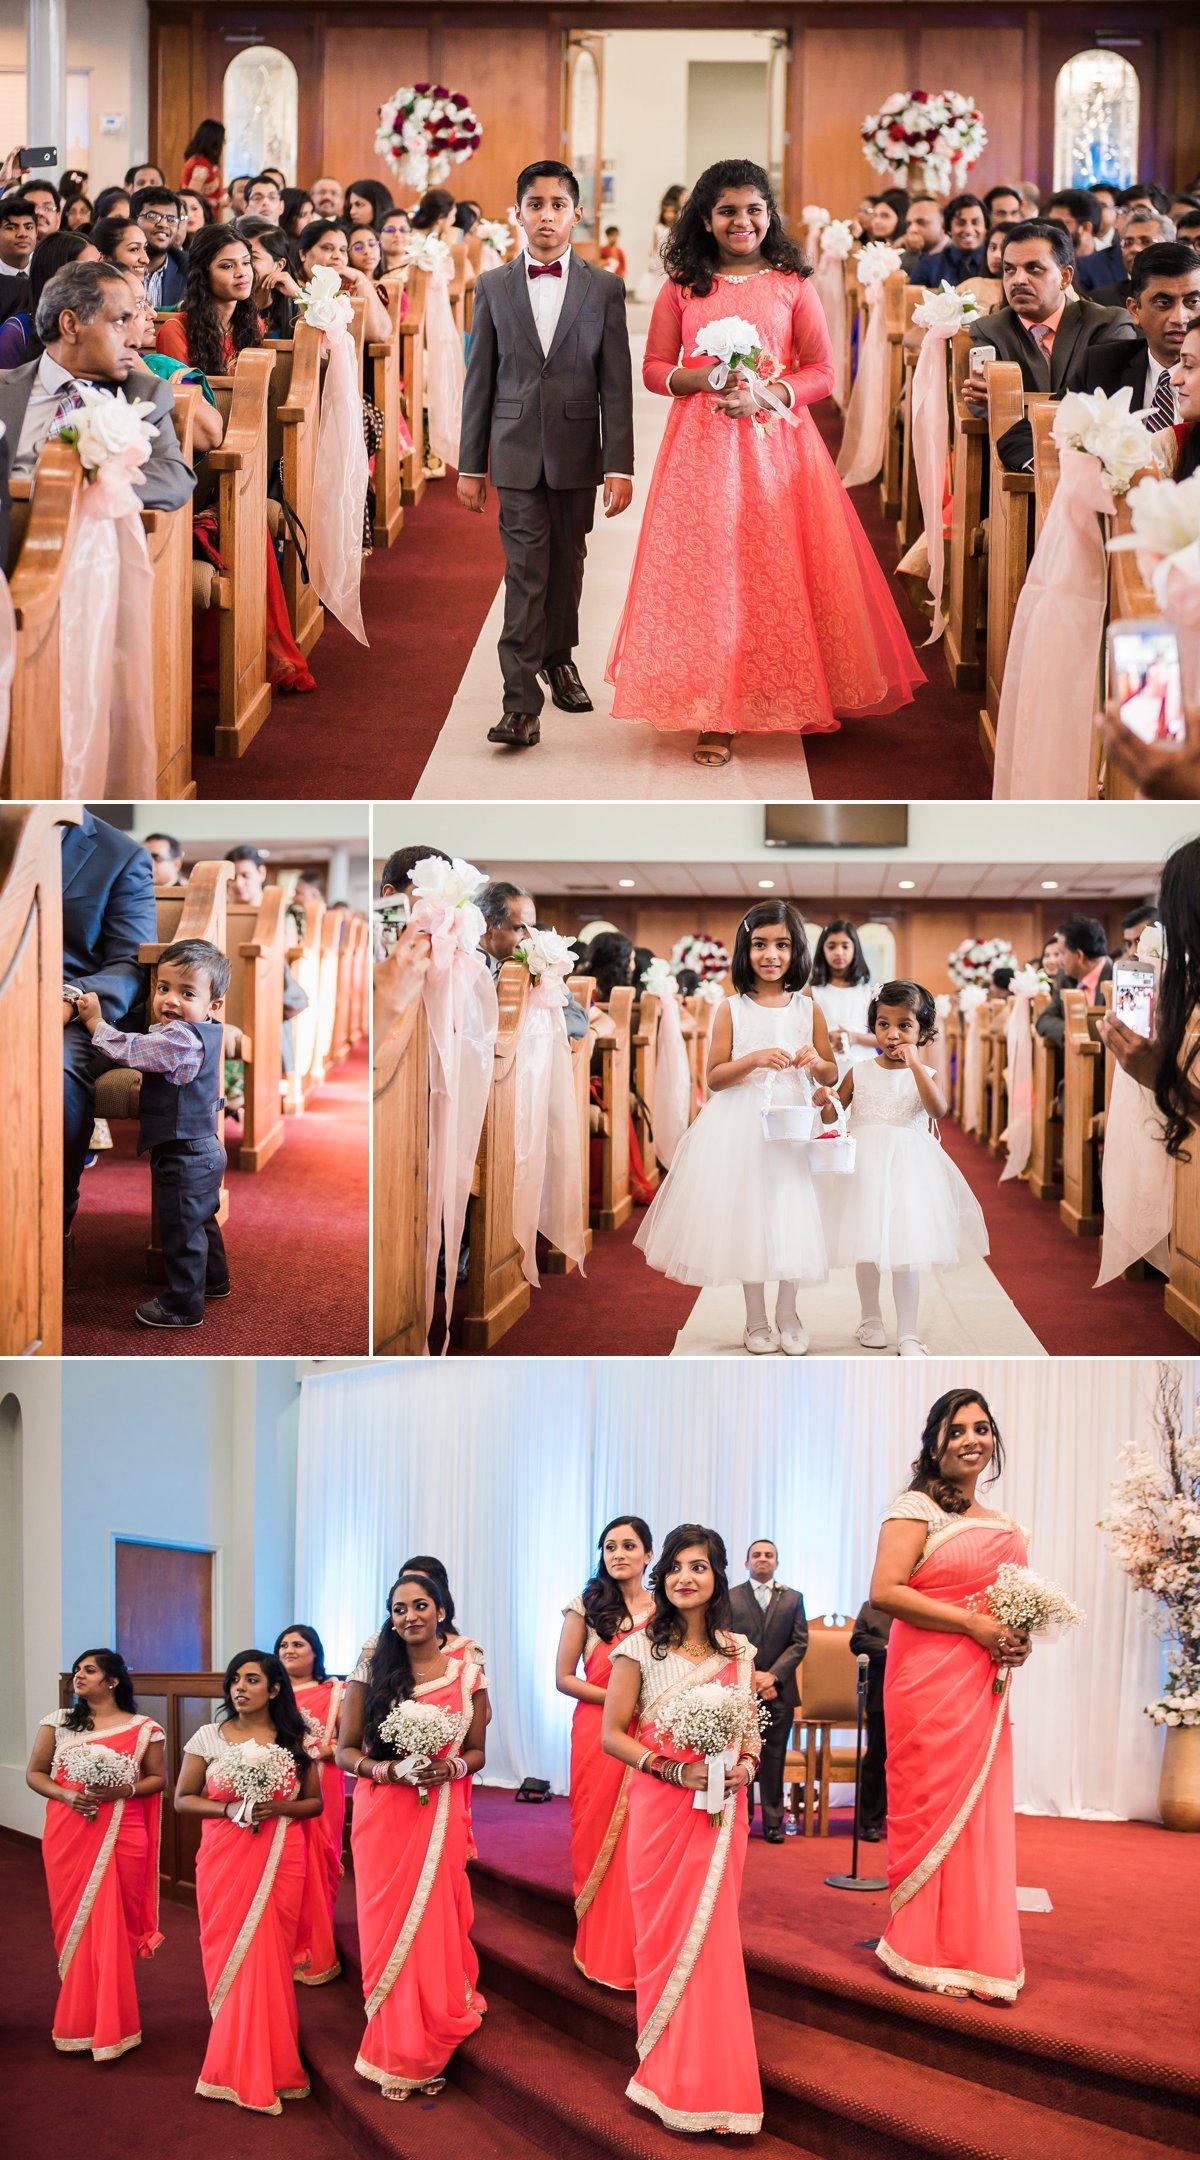 Grace-Allen Indian Wedding Photos by Nate Messarra